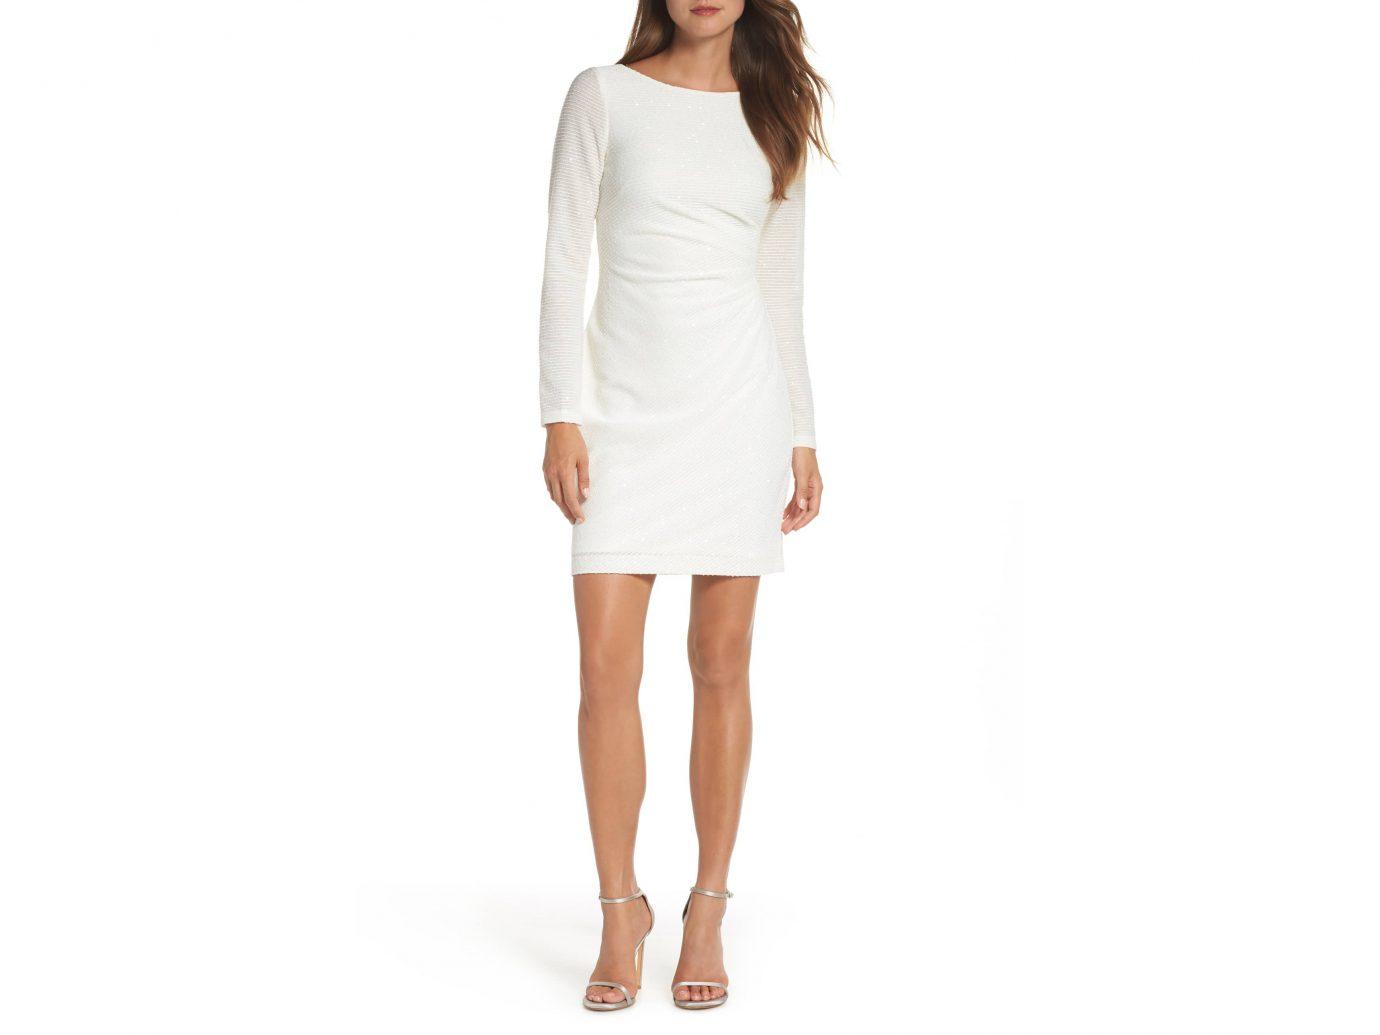 VINCE CAMUTO Sequin Knit Dress